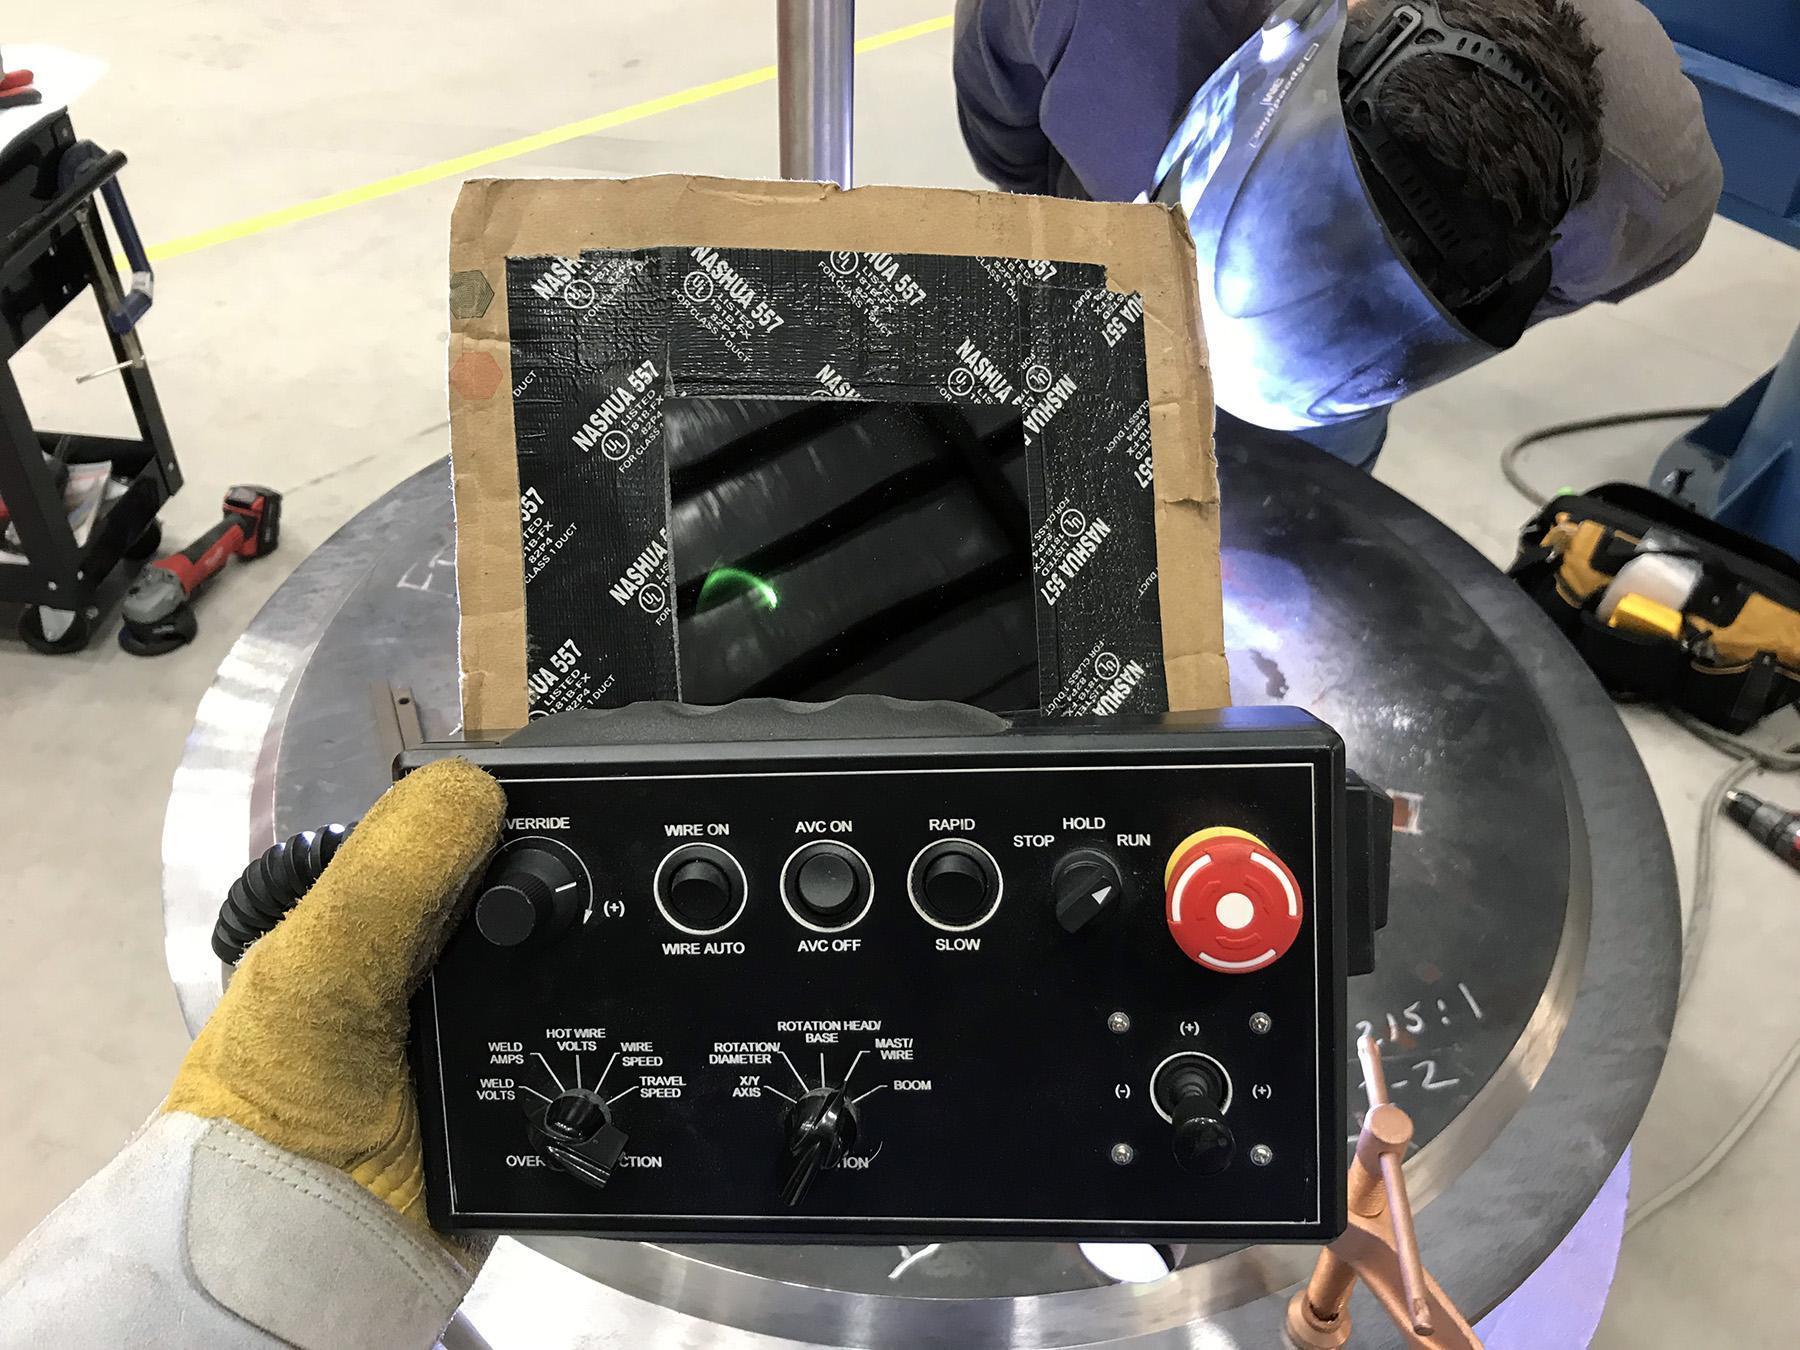 USED, ARC-05i ROTATING HEAD CLADDING SYSTEM